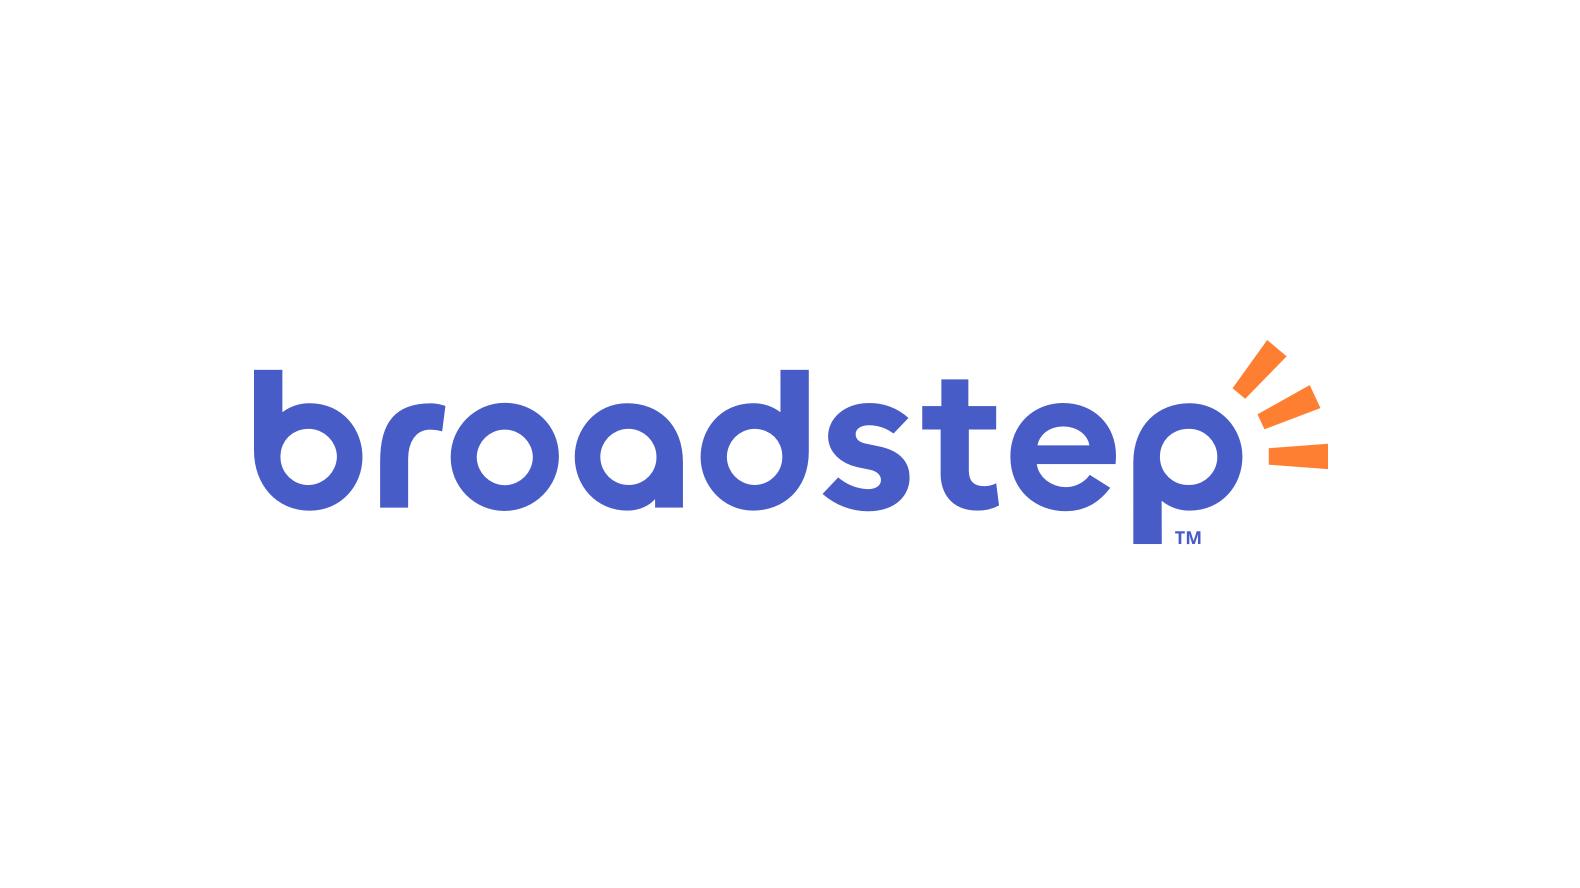 Broadstep